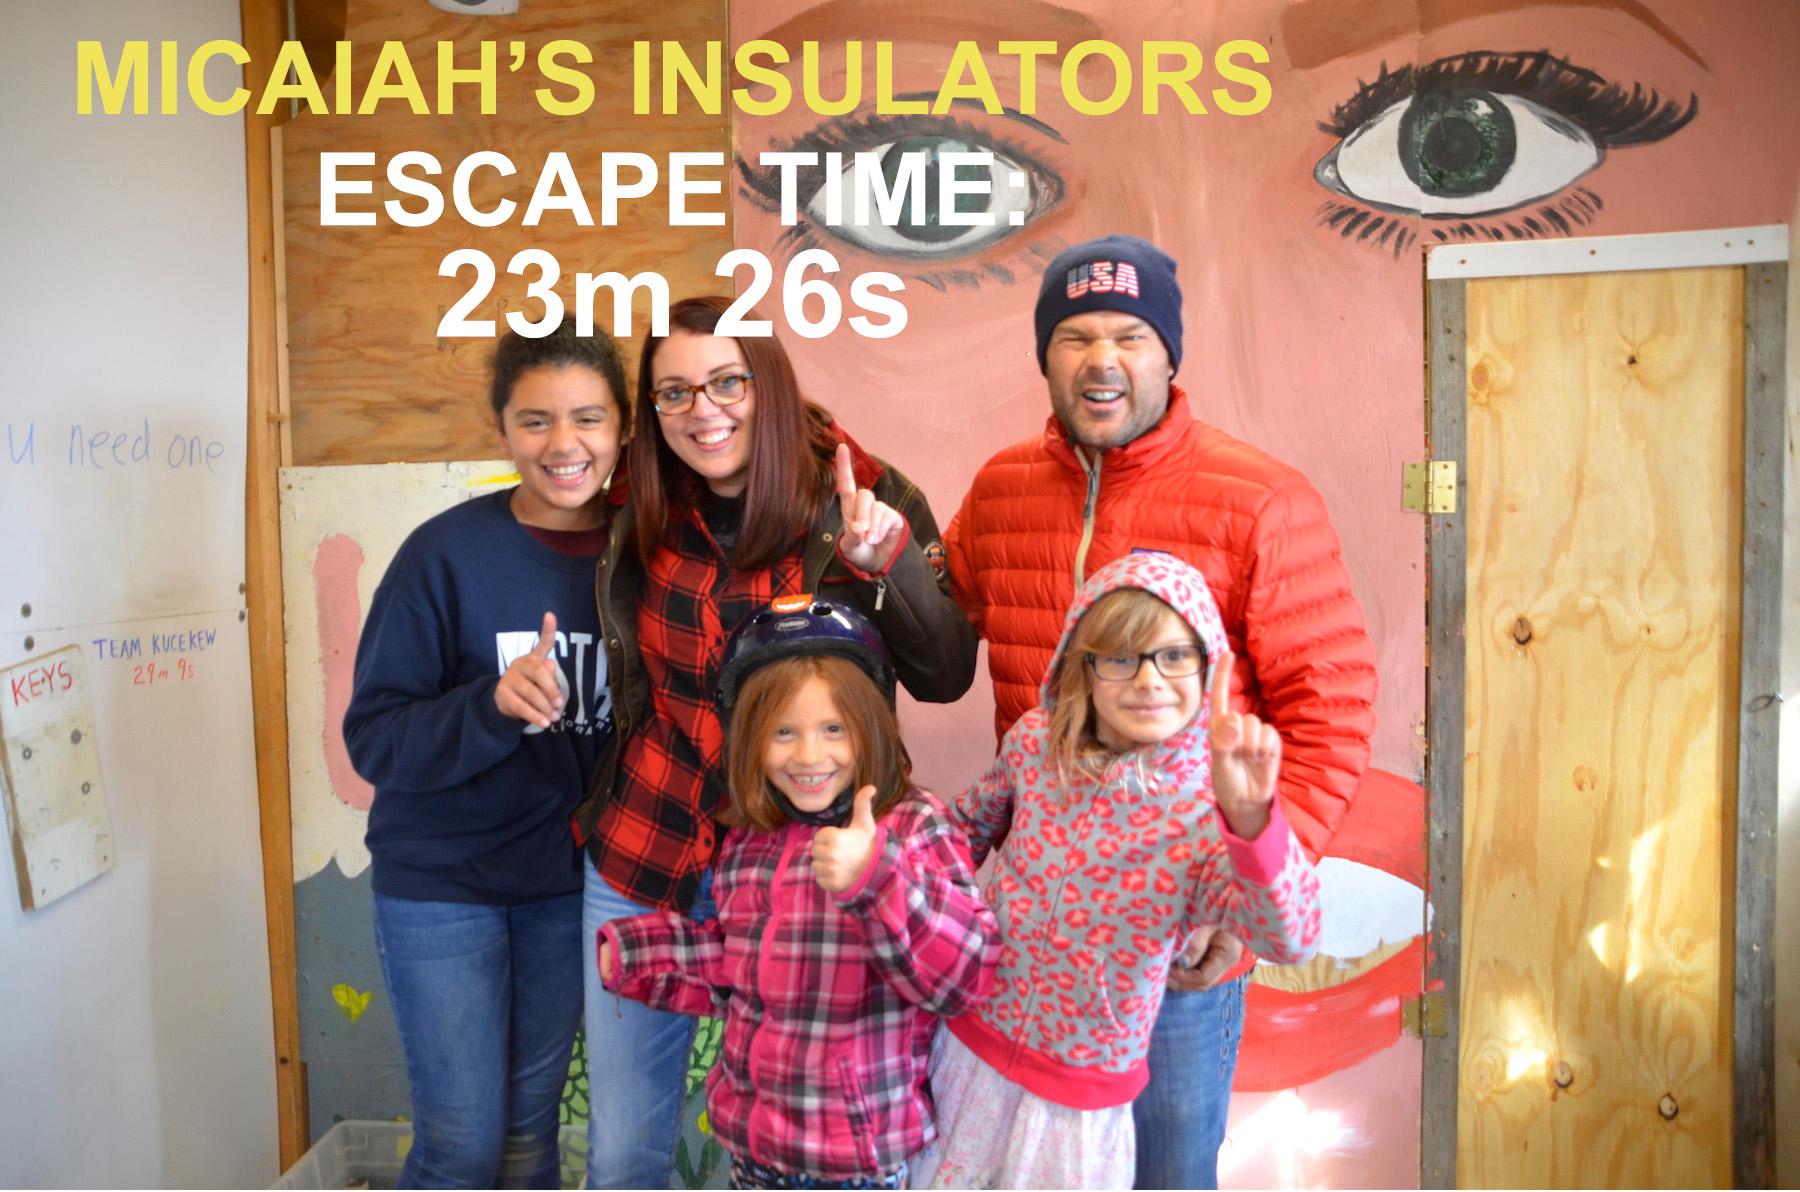 Micaiahs Insulators.jpg